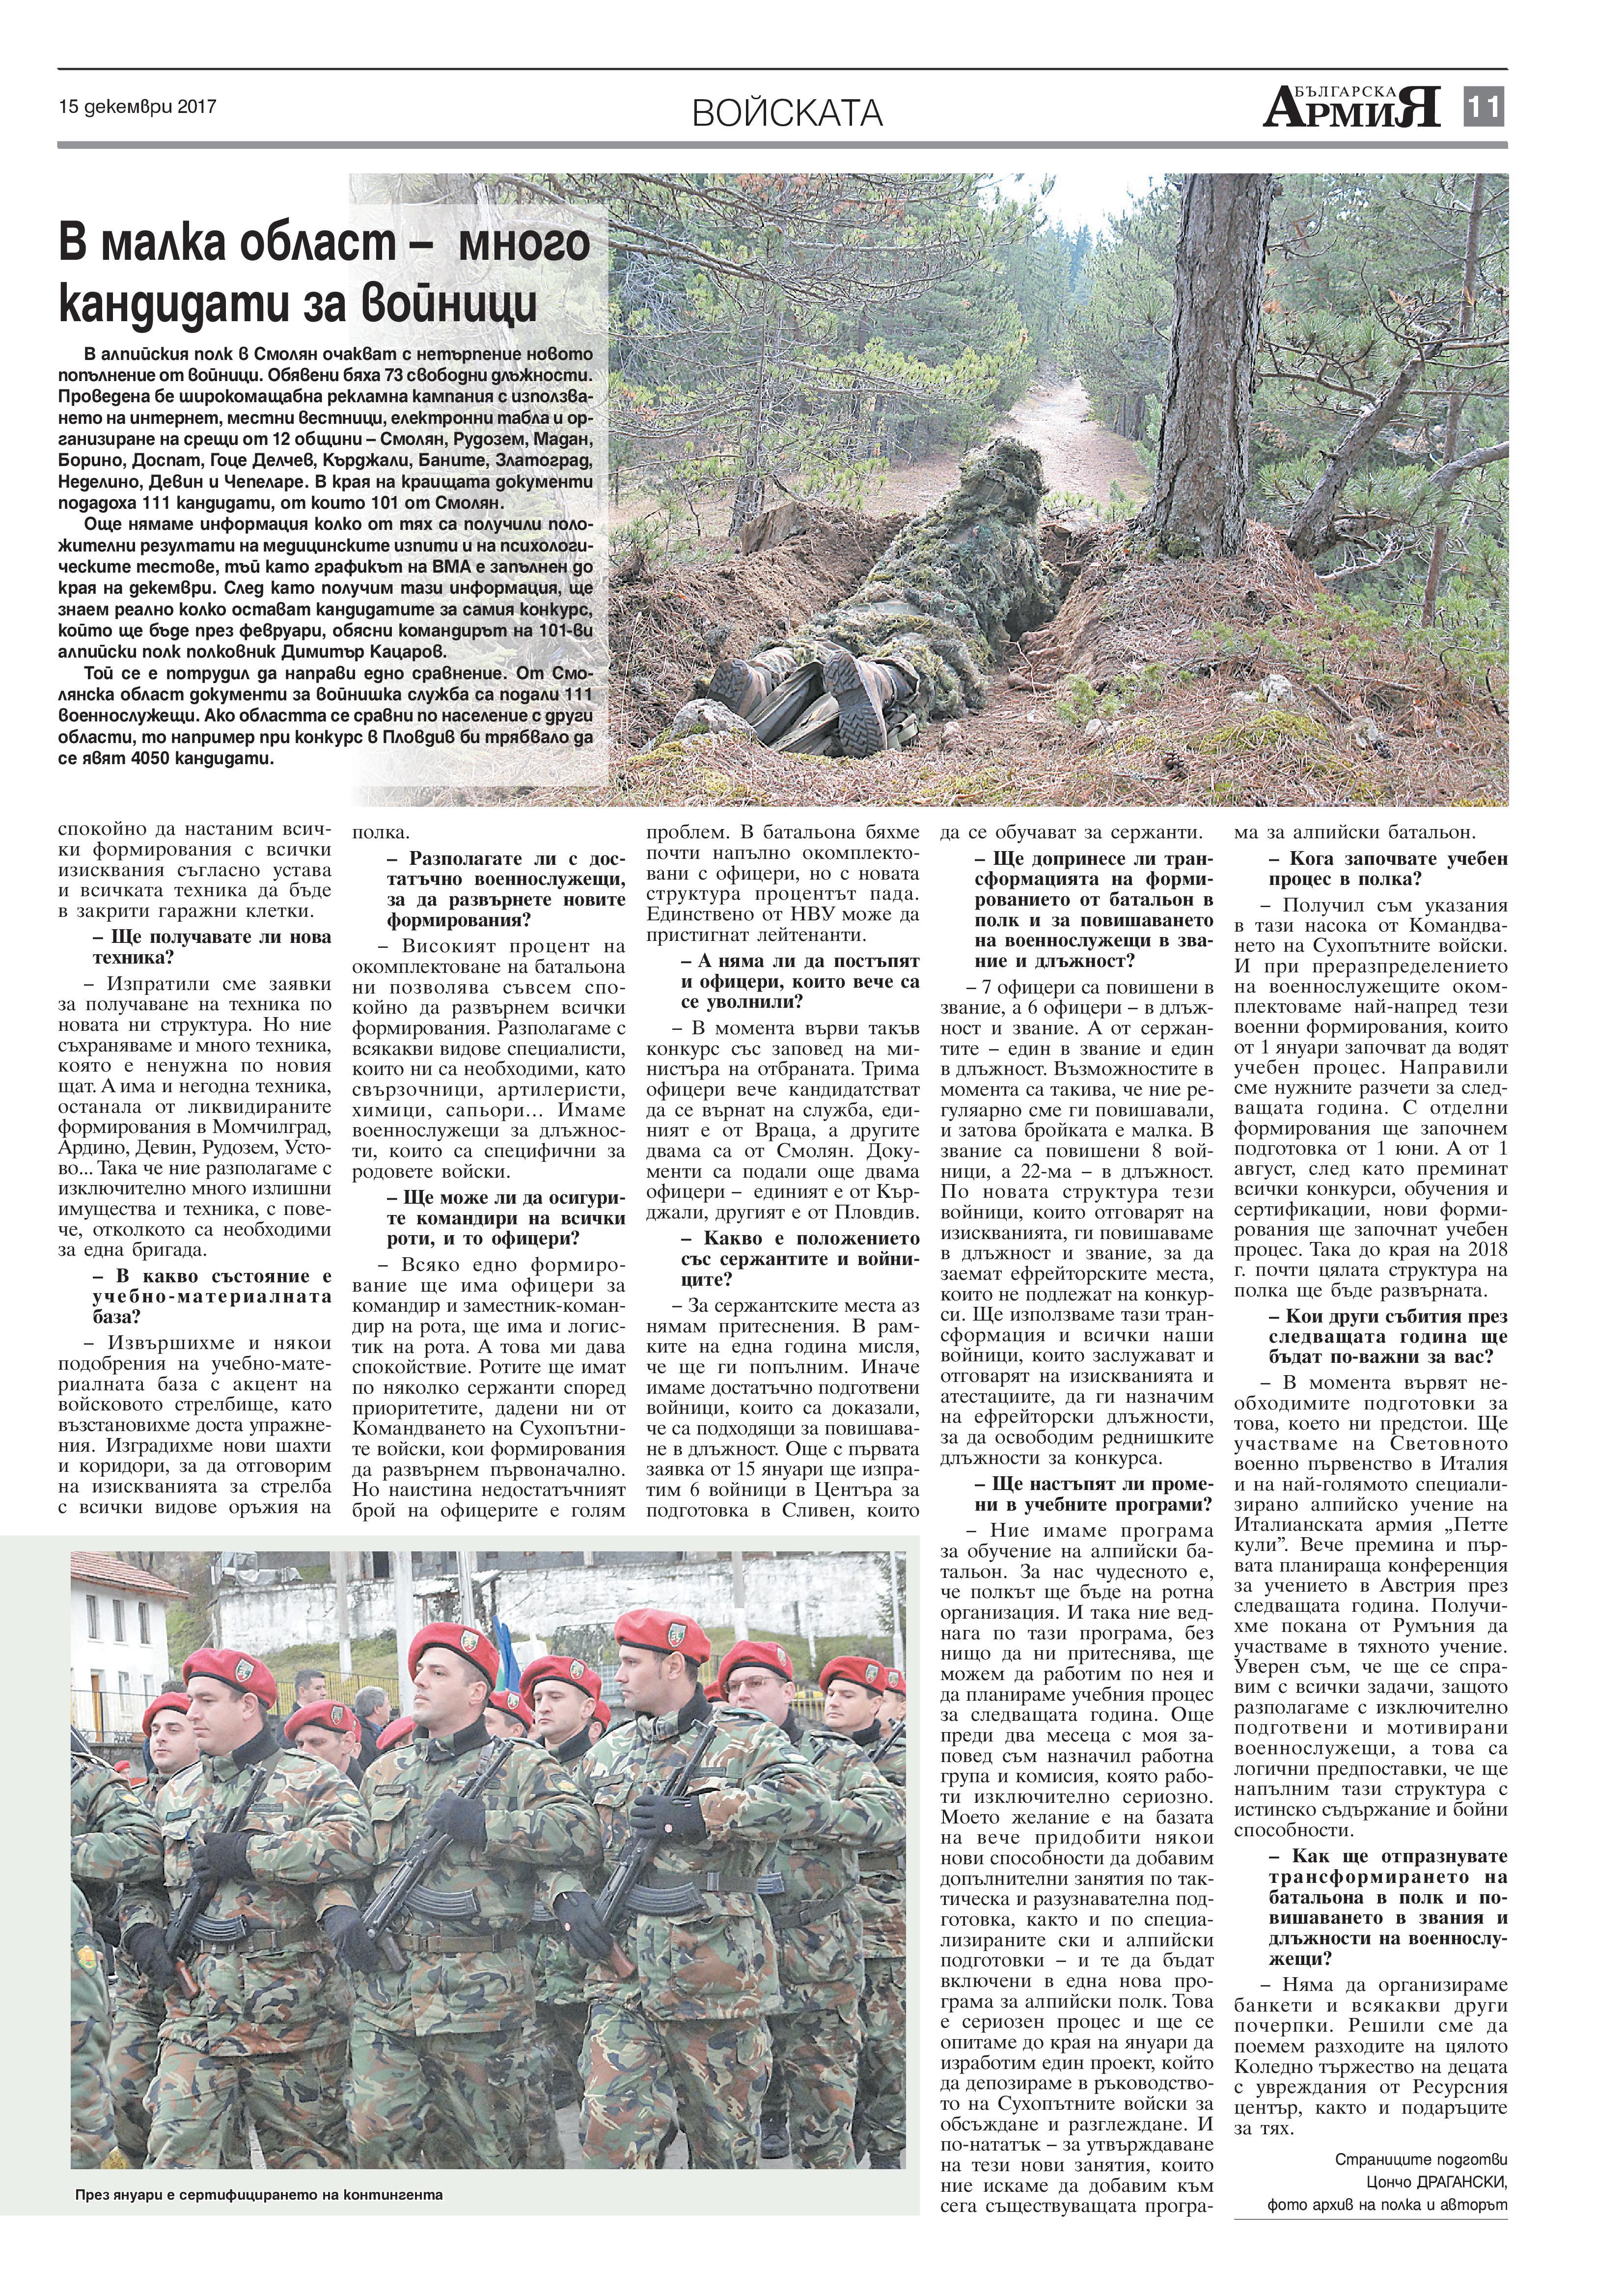 http://armymedia.bg/wp-content/uploads/2015/06/11-15.jpg